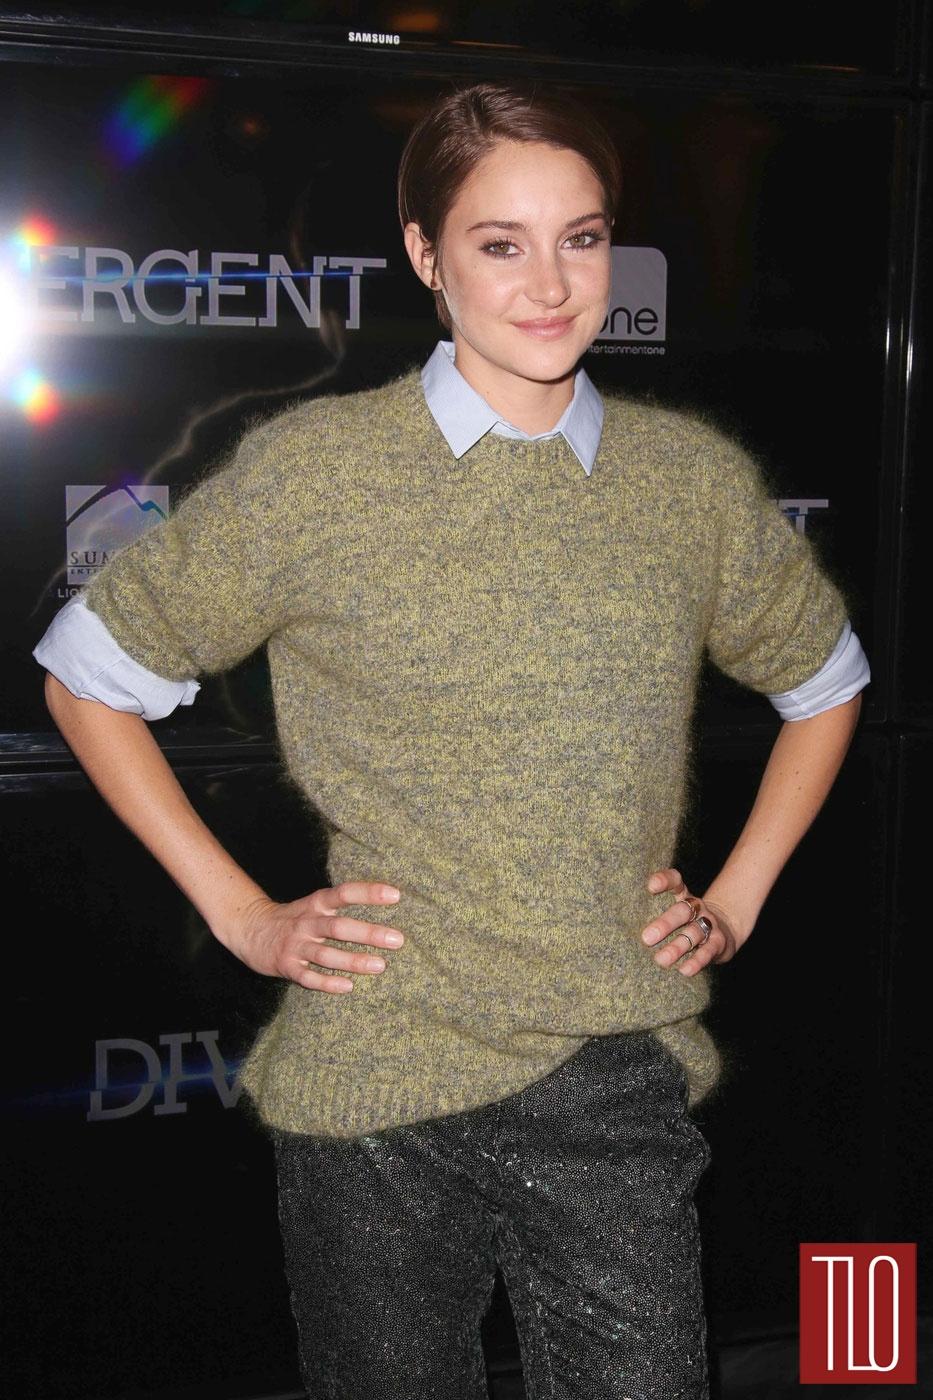 Shailene-Woodley-Divergent-Toronto-Premiere-No-21-Tom-Lorenzo-Site-TLO (1)